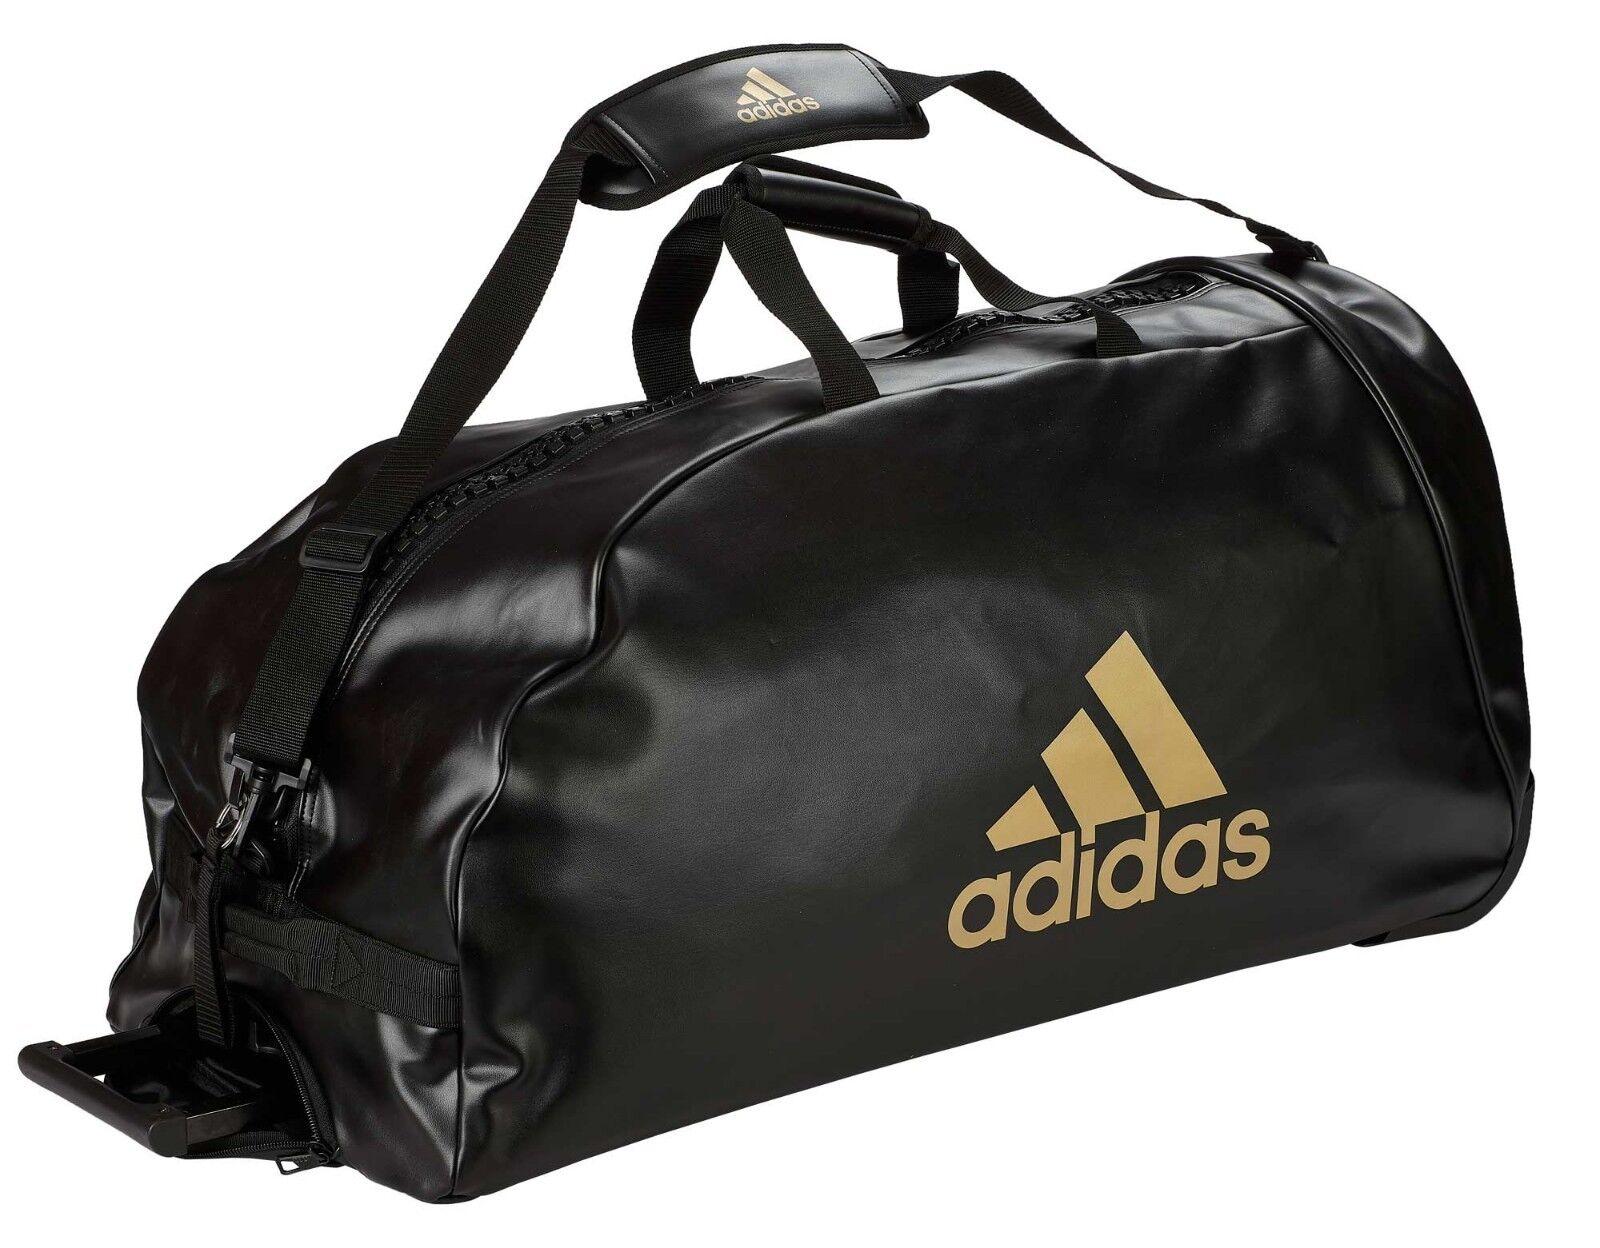 Adidas trolley  Martial Arts  negro oro pu, adiacc 056-bolsa de gimnasia-carretilla